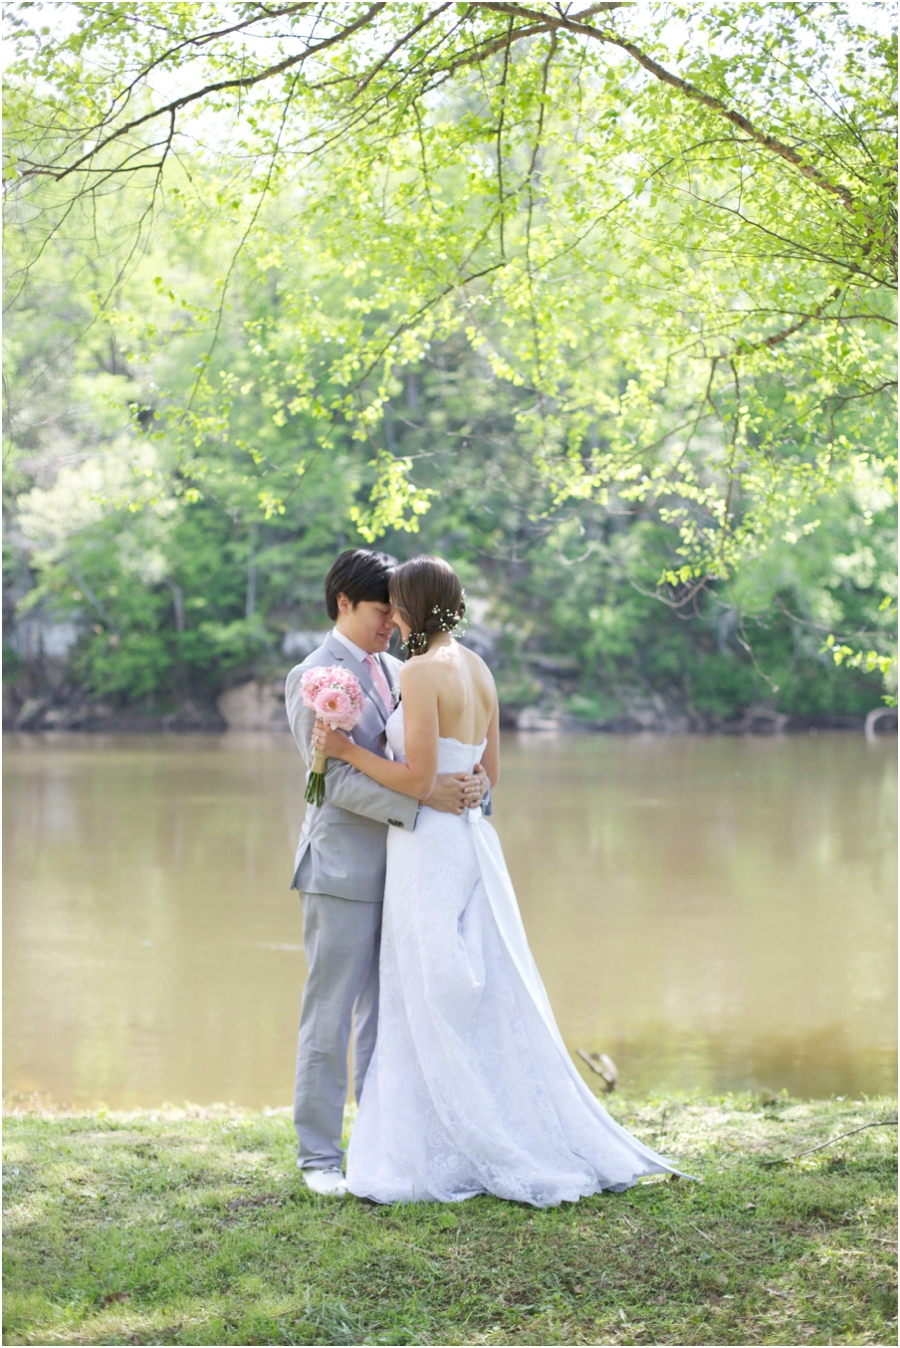 romantic wedding portrait photography, spring wedding photographers